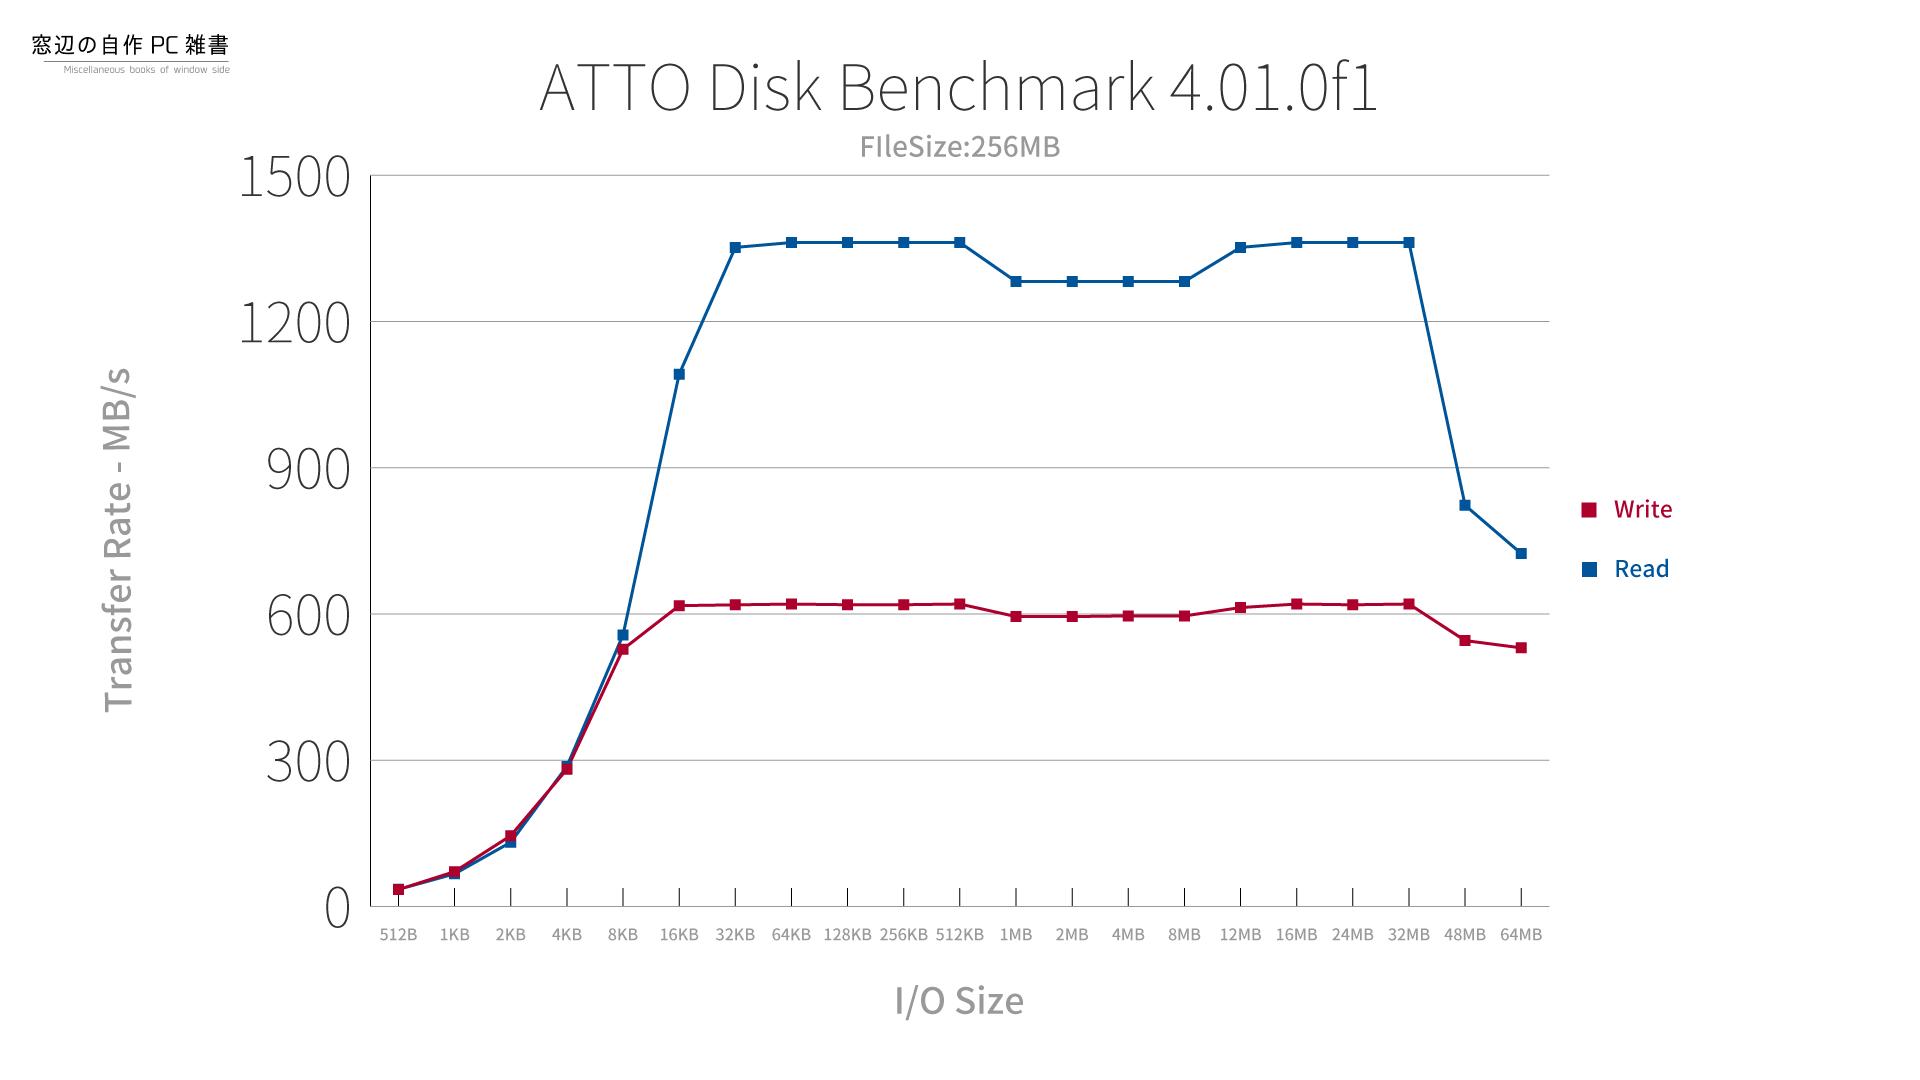 intel Optane 800pのATTO Disk Benchmarkの結果(FileSize:256MB)